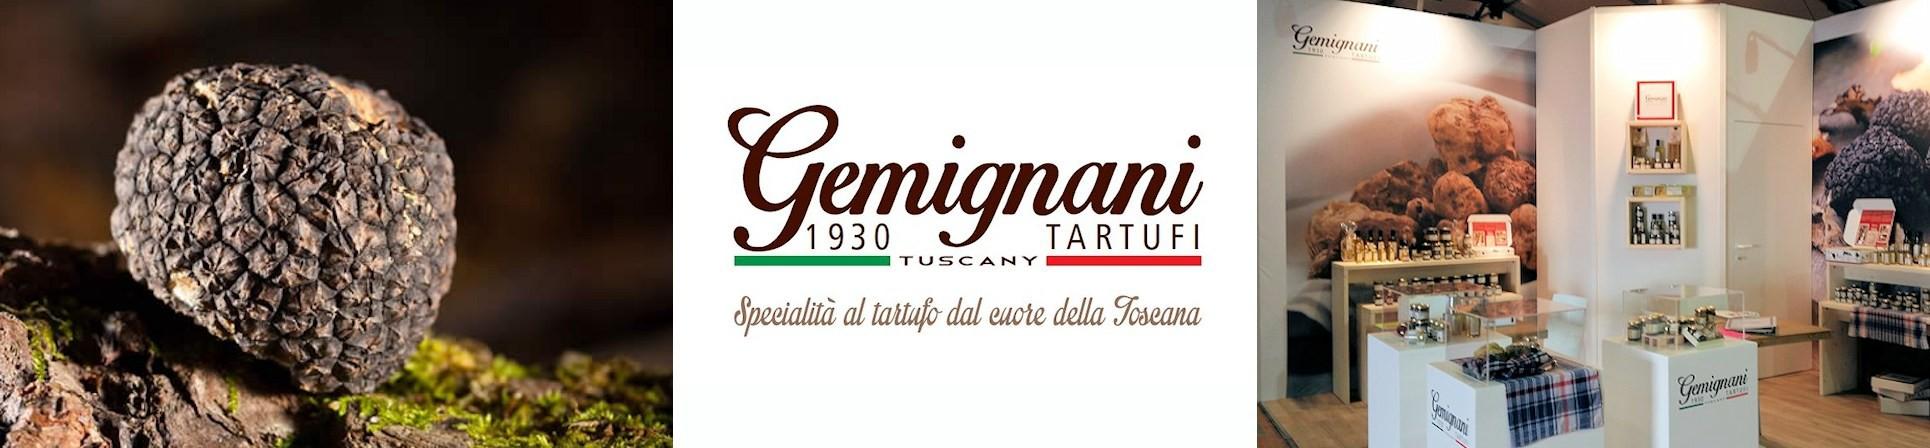 Gemignani Tartufi, terra di Toscana - vendita online